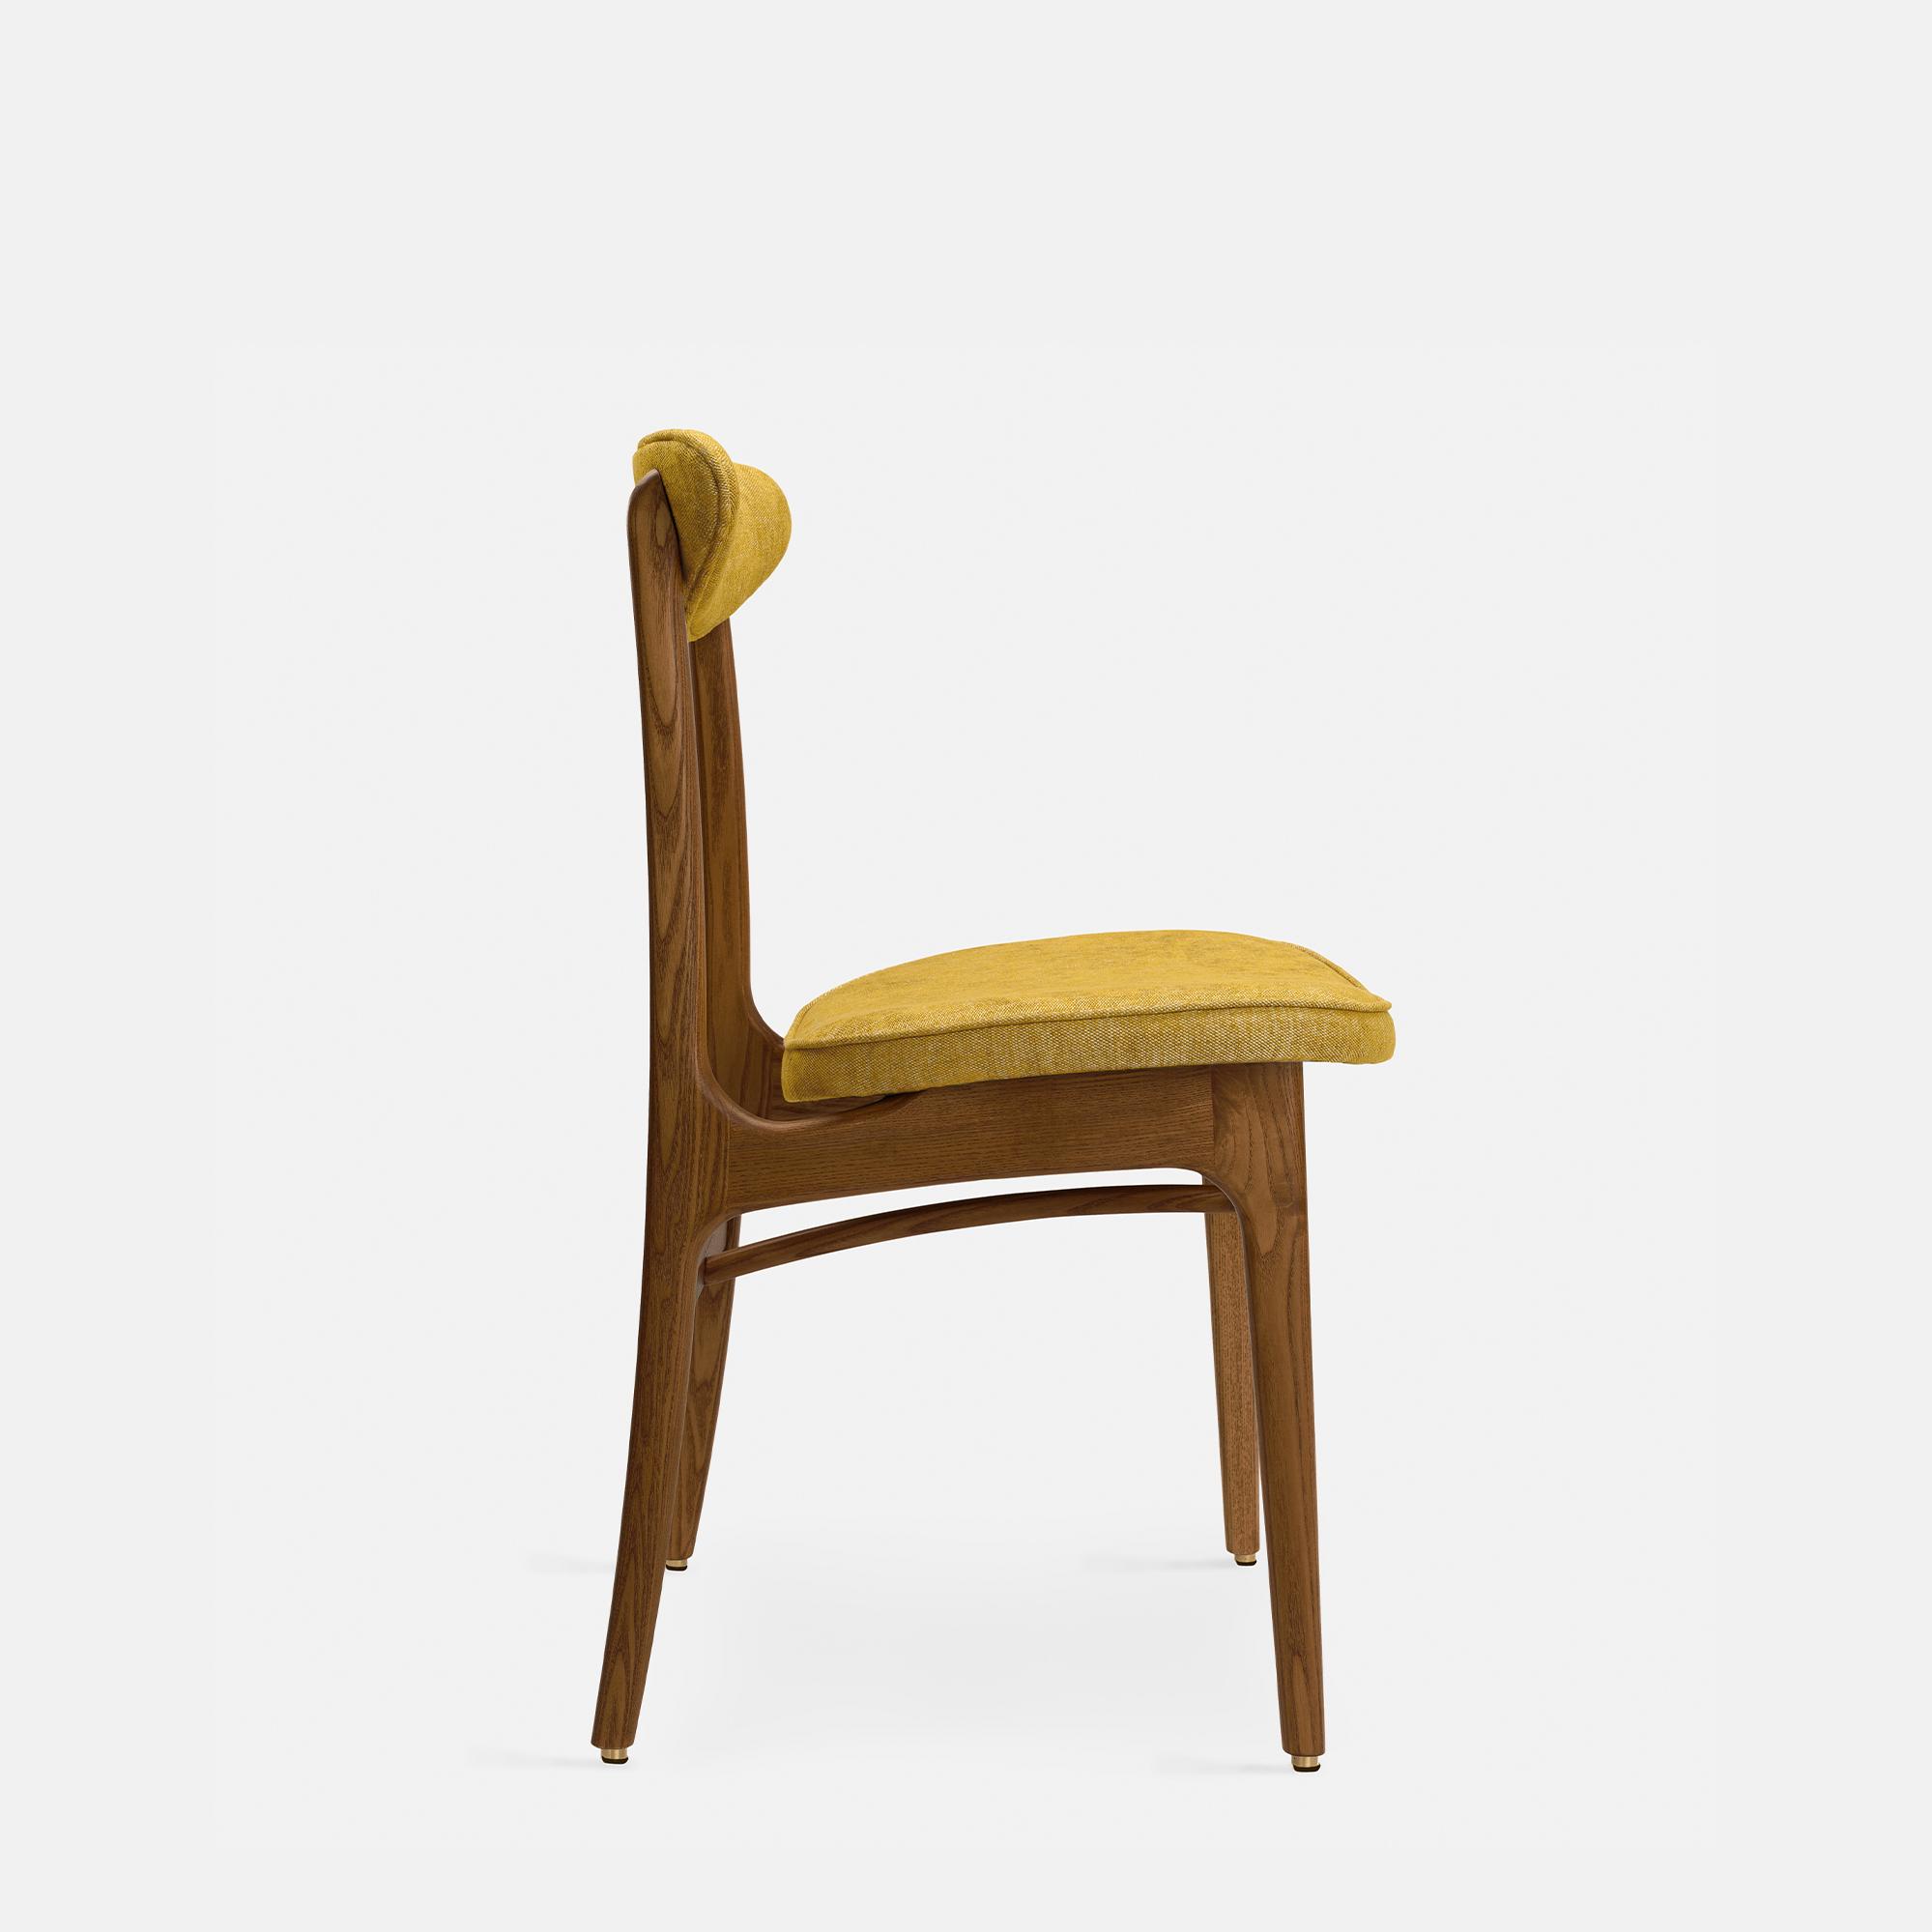 366-Concept-200-190-Chair-W03-Loft-Mustard-side